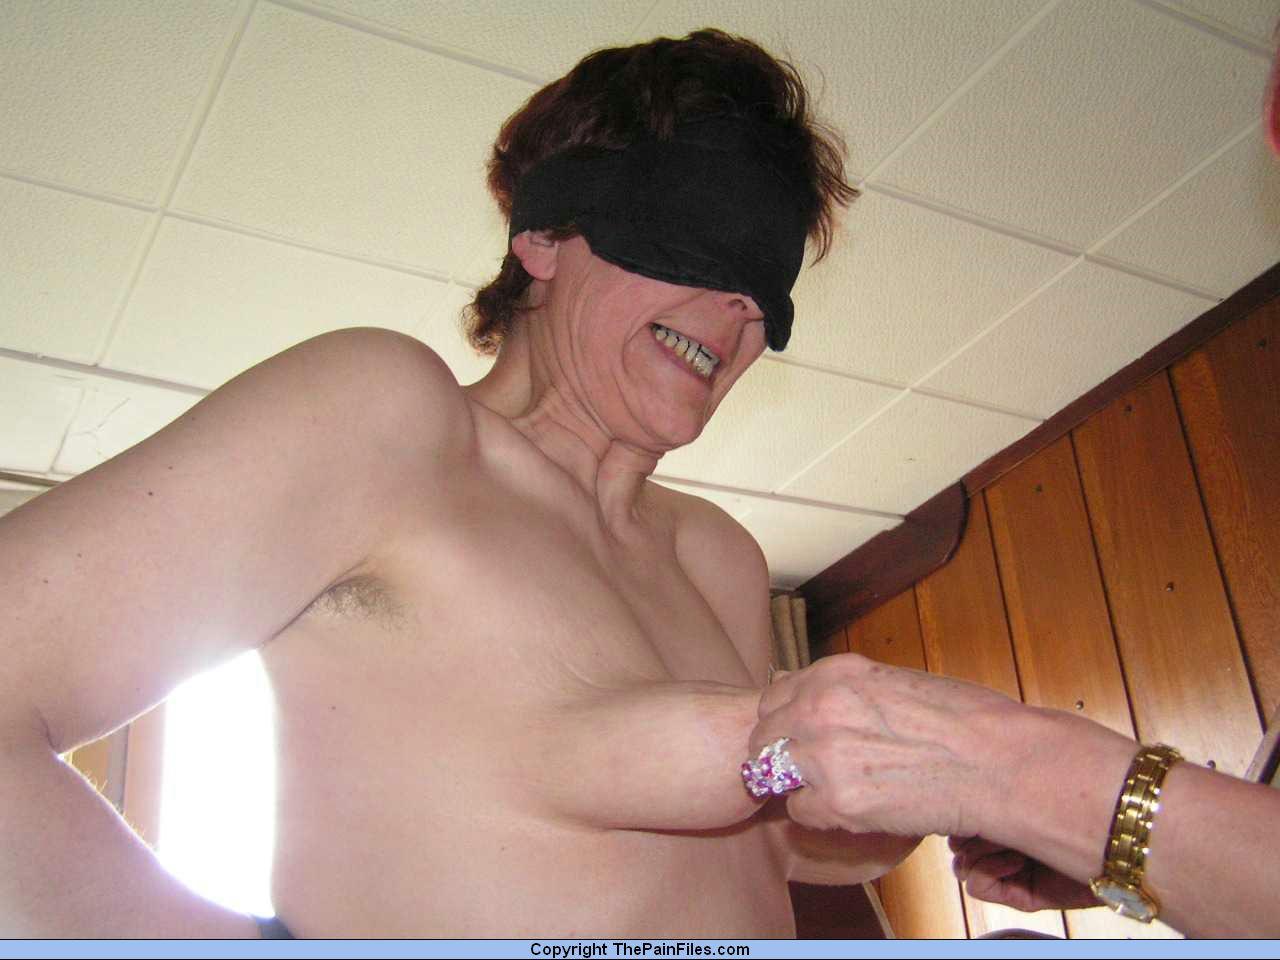 Body spank pain granny this